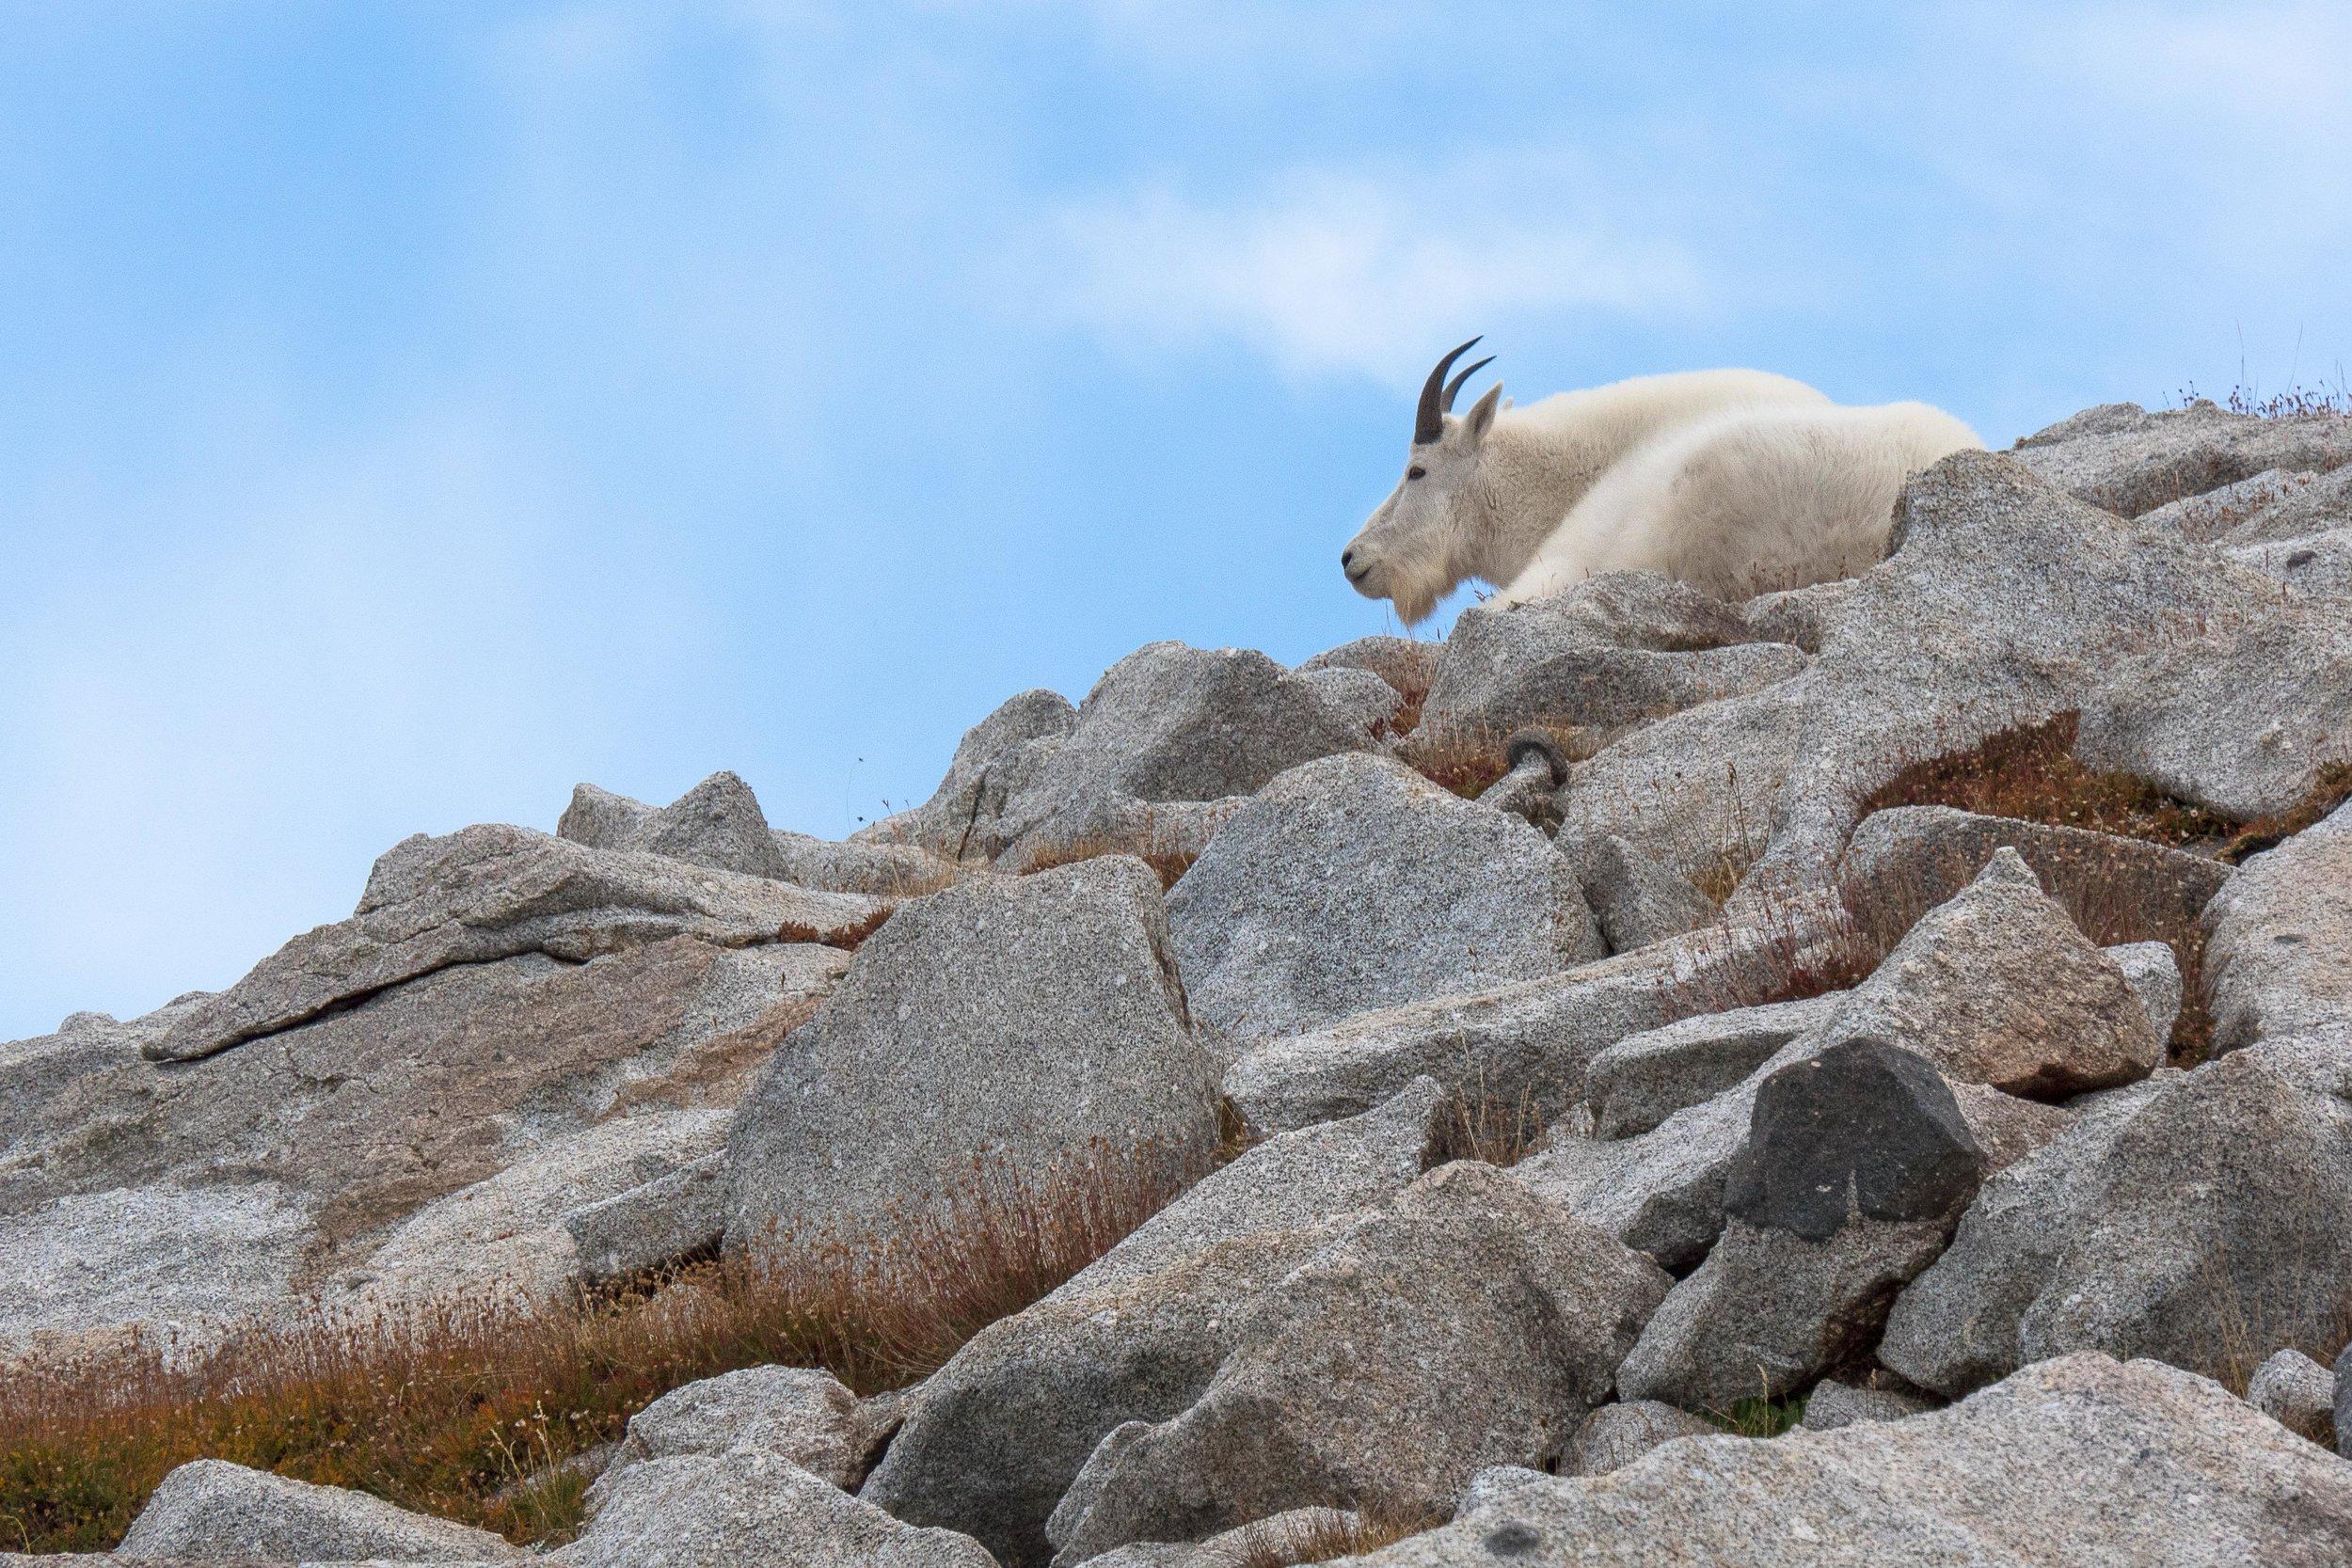 2016 - King of the Mountain, Lone Peak Wilderness